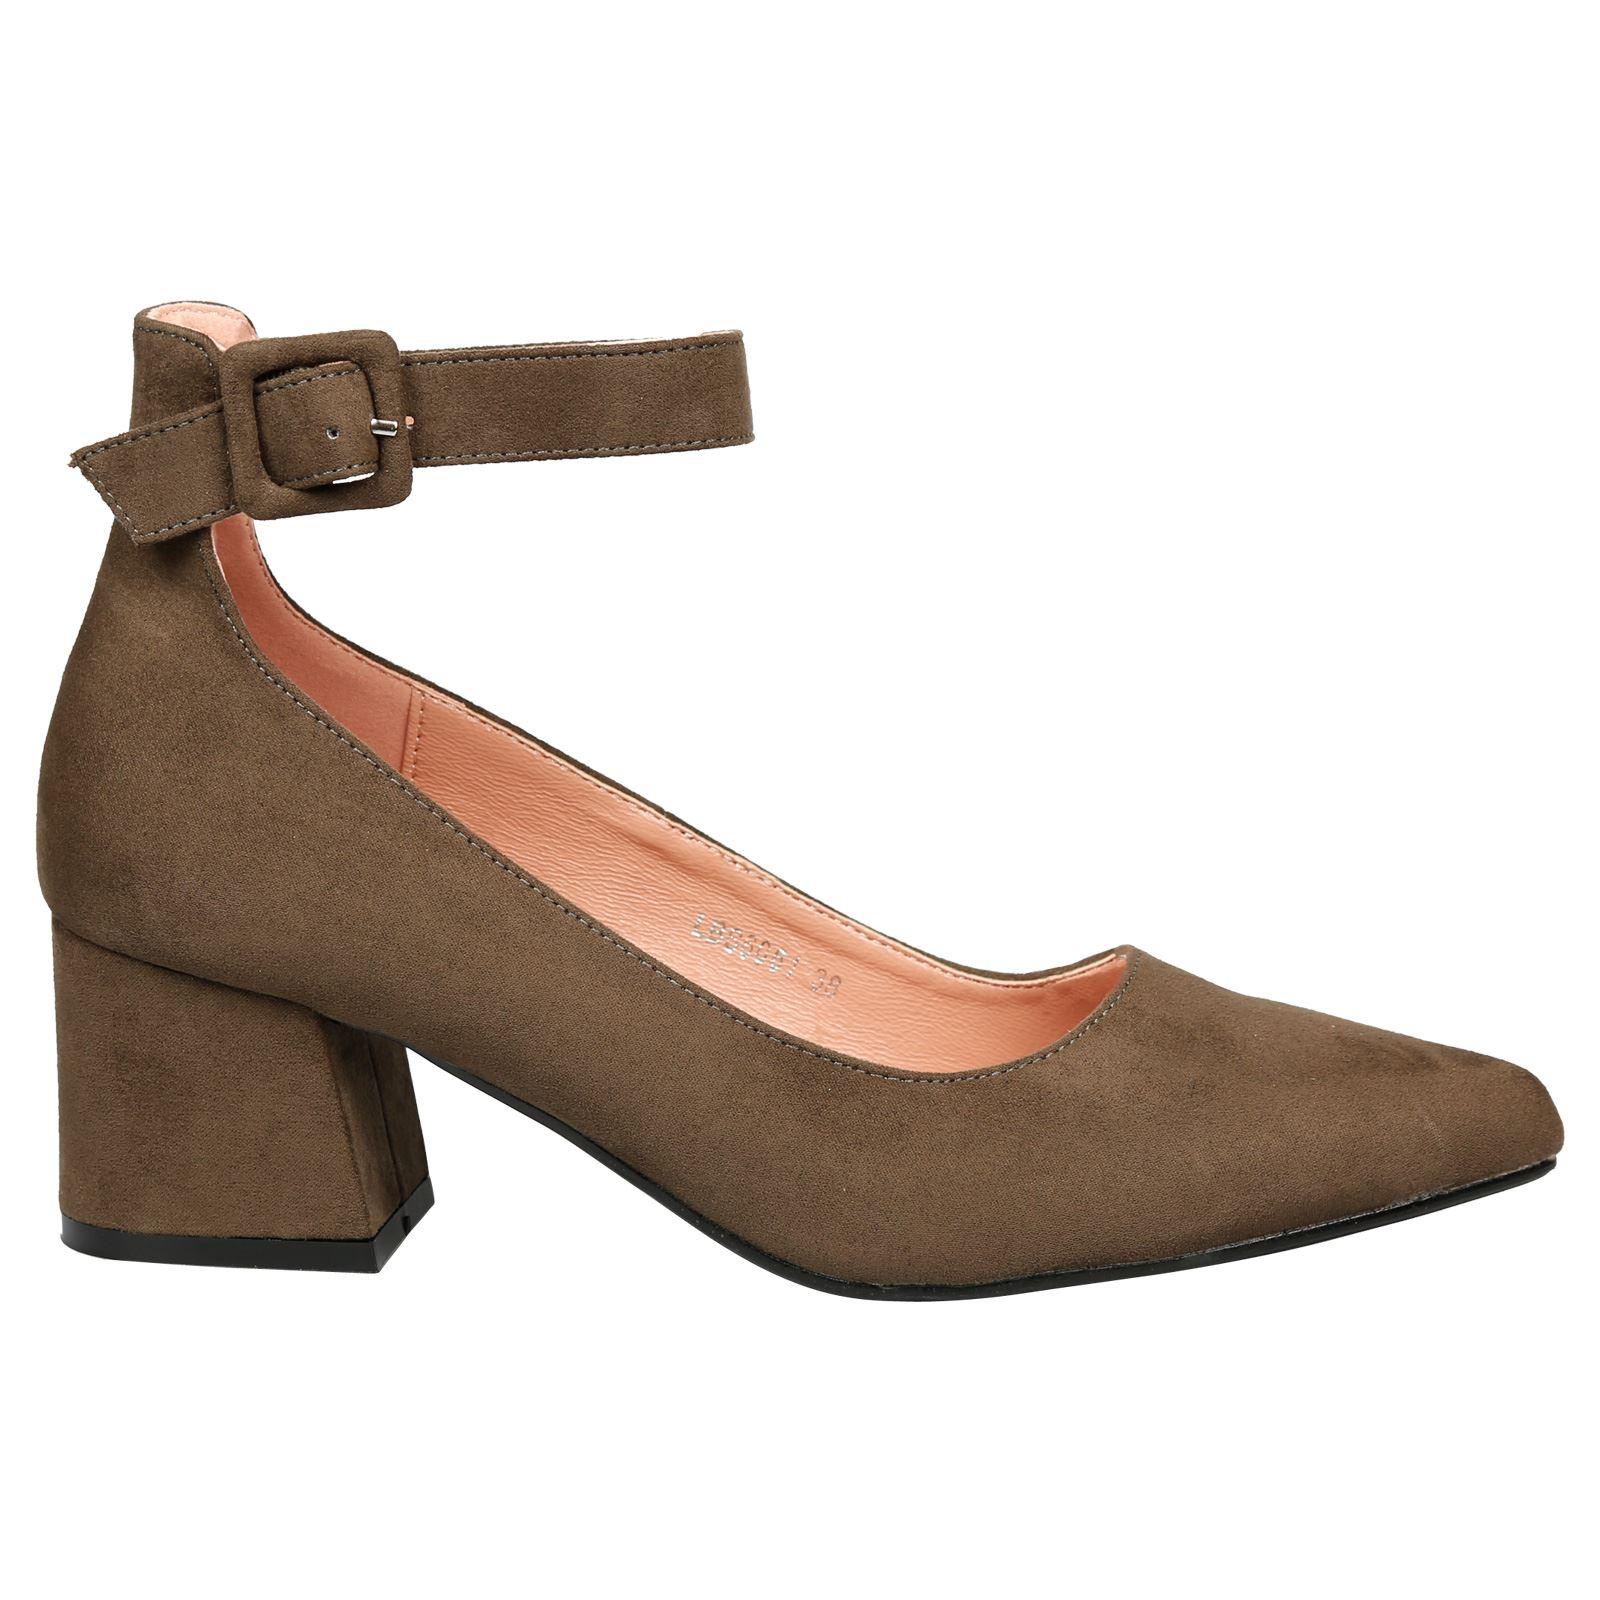 fdf570cbc49d Annalise Womens Low Mid Block Heel Ankle Strap Court Shoes Ladies ...